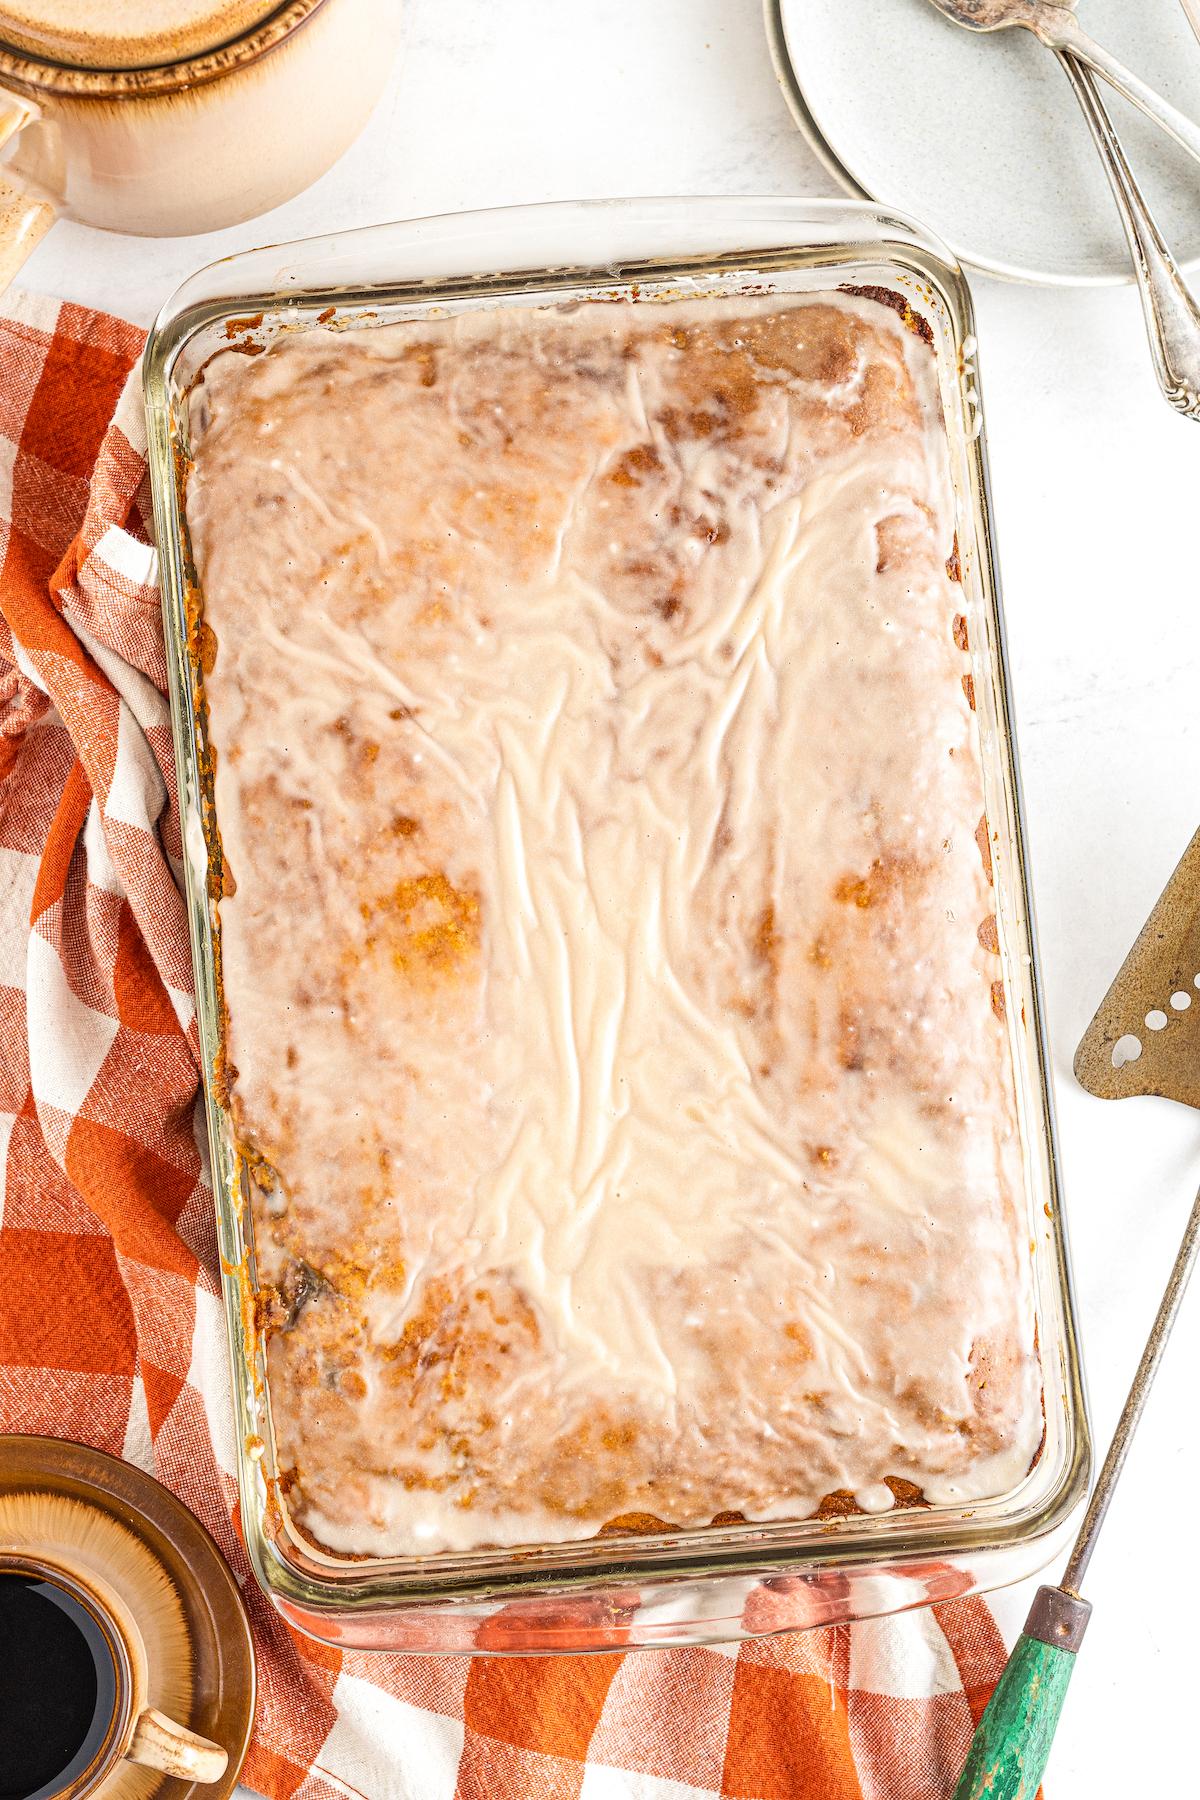 Glazed honeybun cake in a pan.